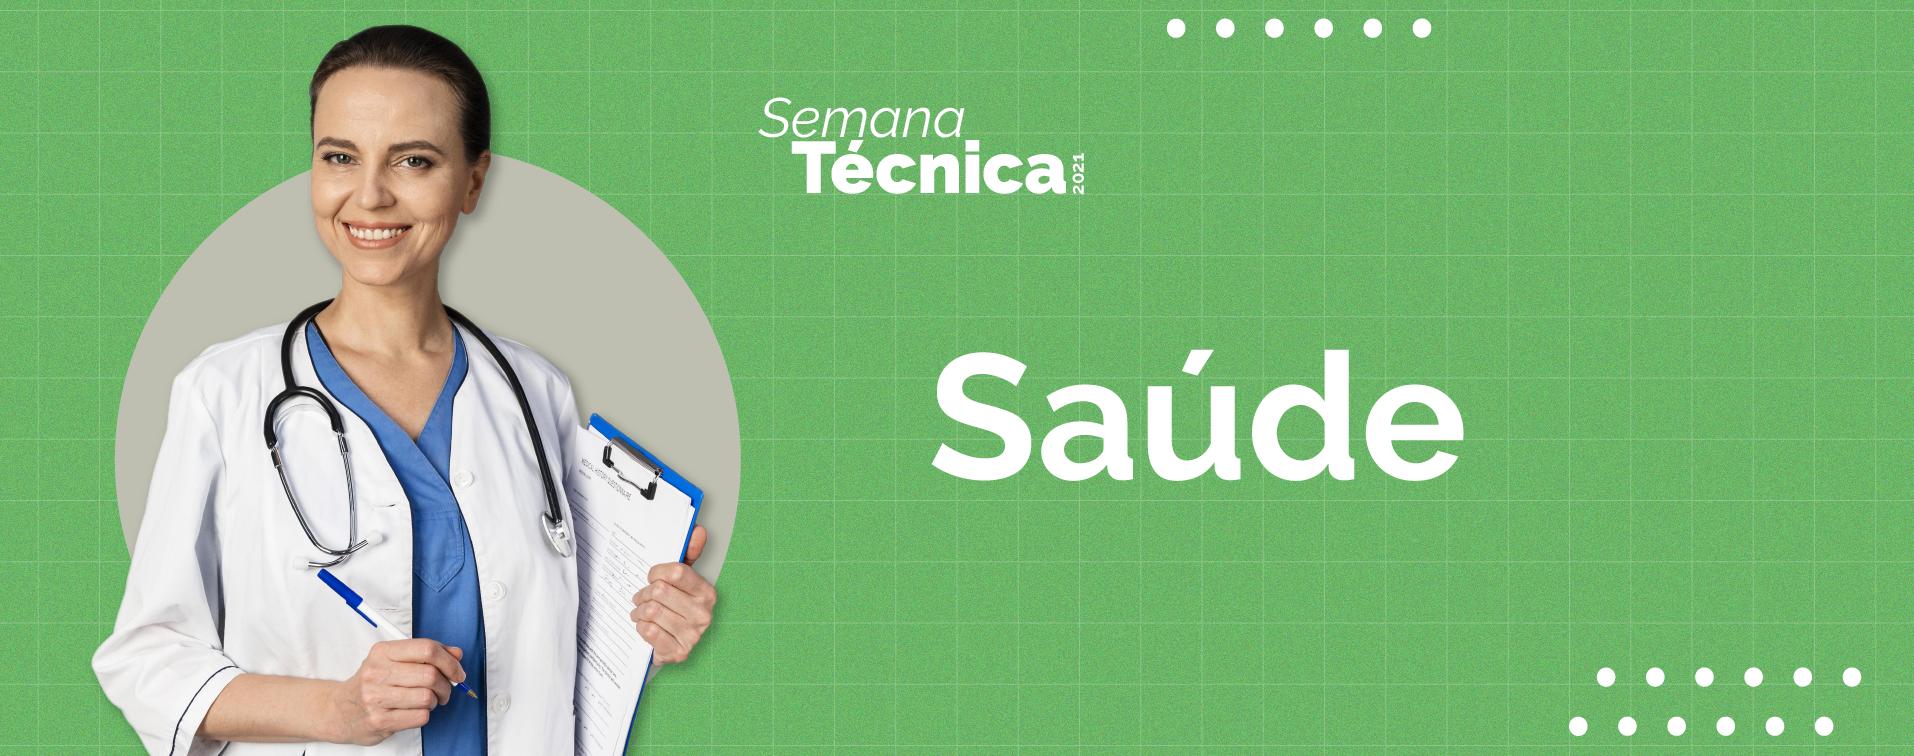 Capa curso UNIAPAE-SP - Semana Técnica - Saúde_Prancheta 1